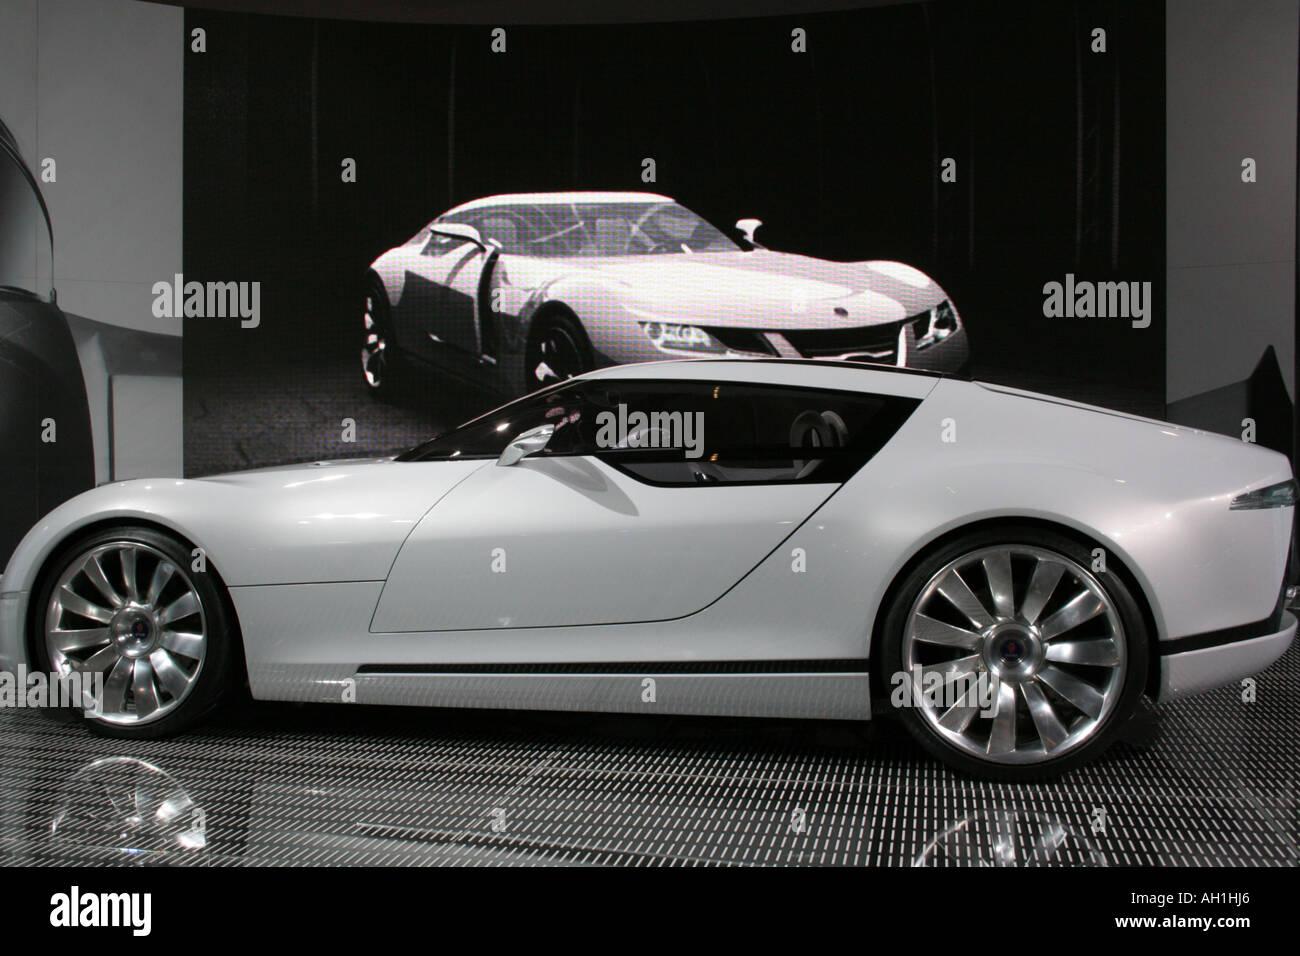 Saab Concept Car Motor Car At The British International Motor Show